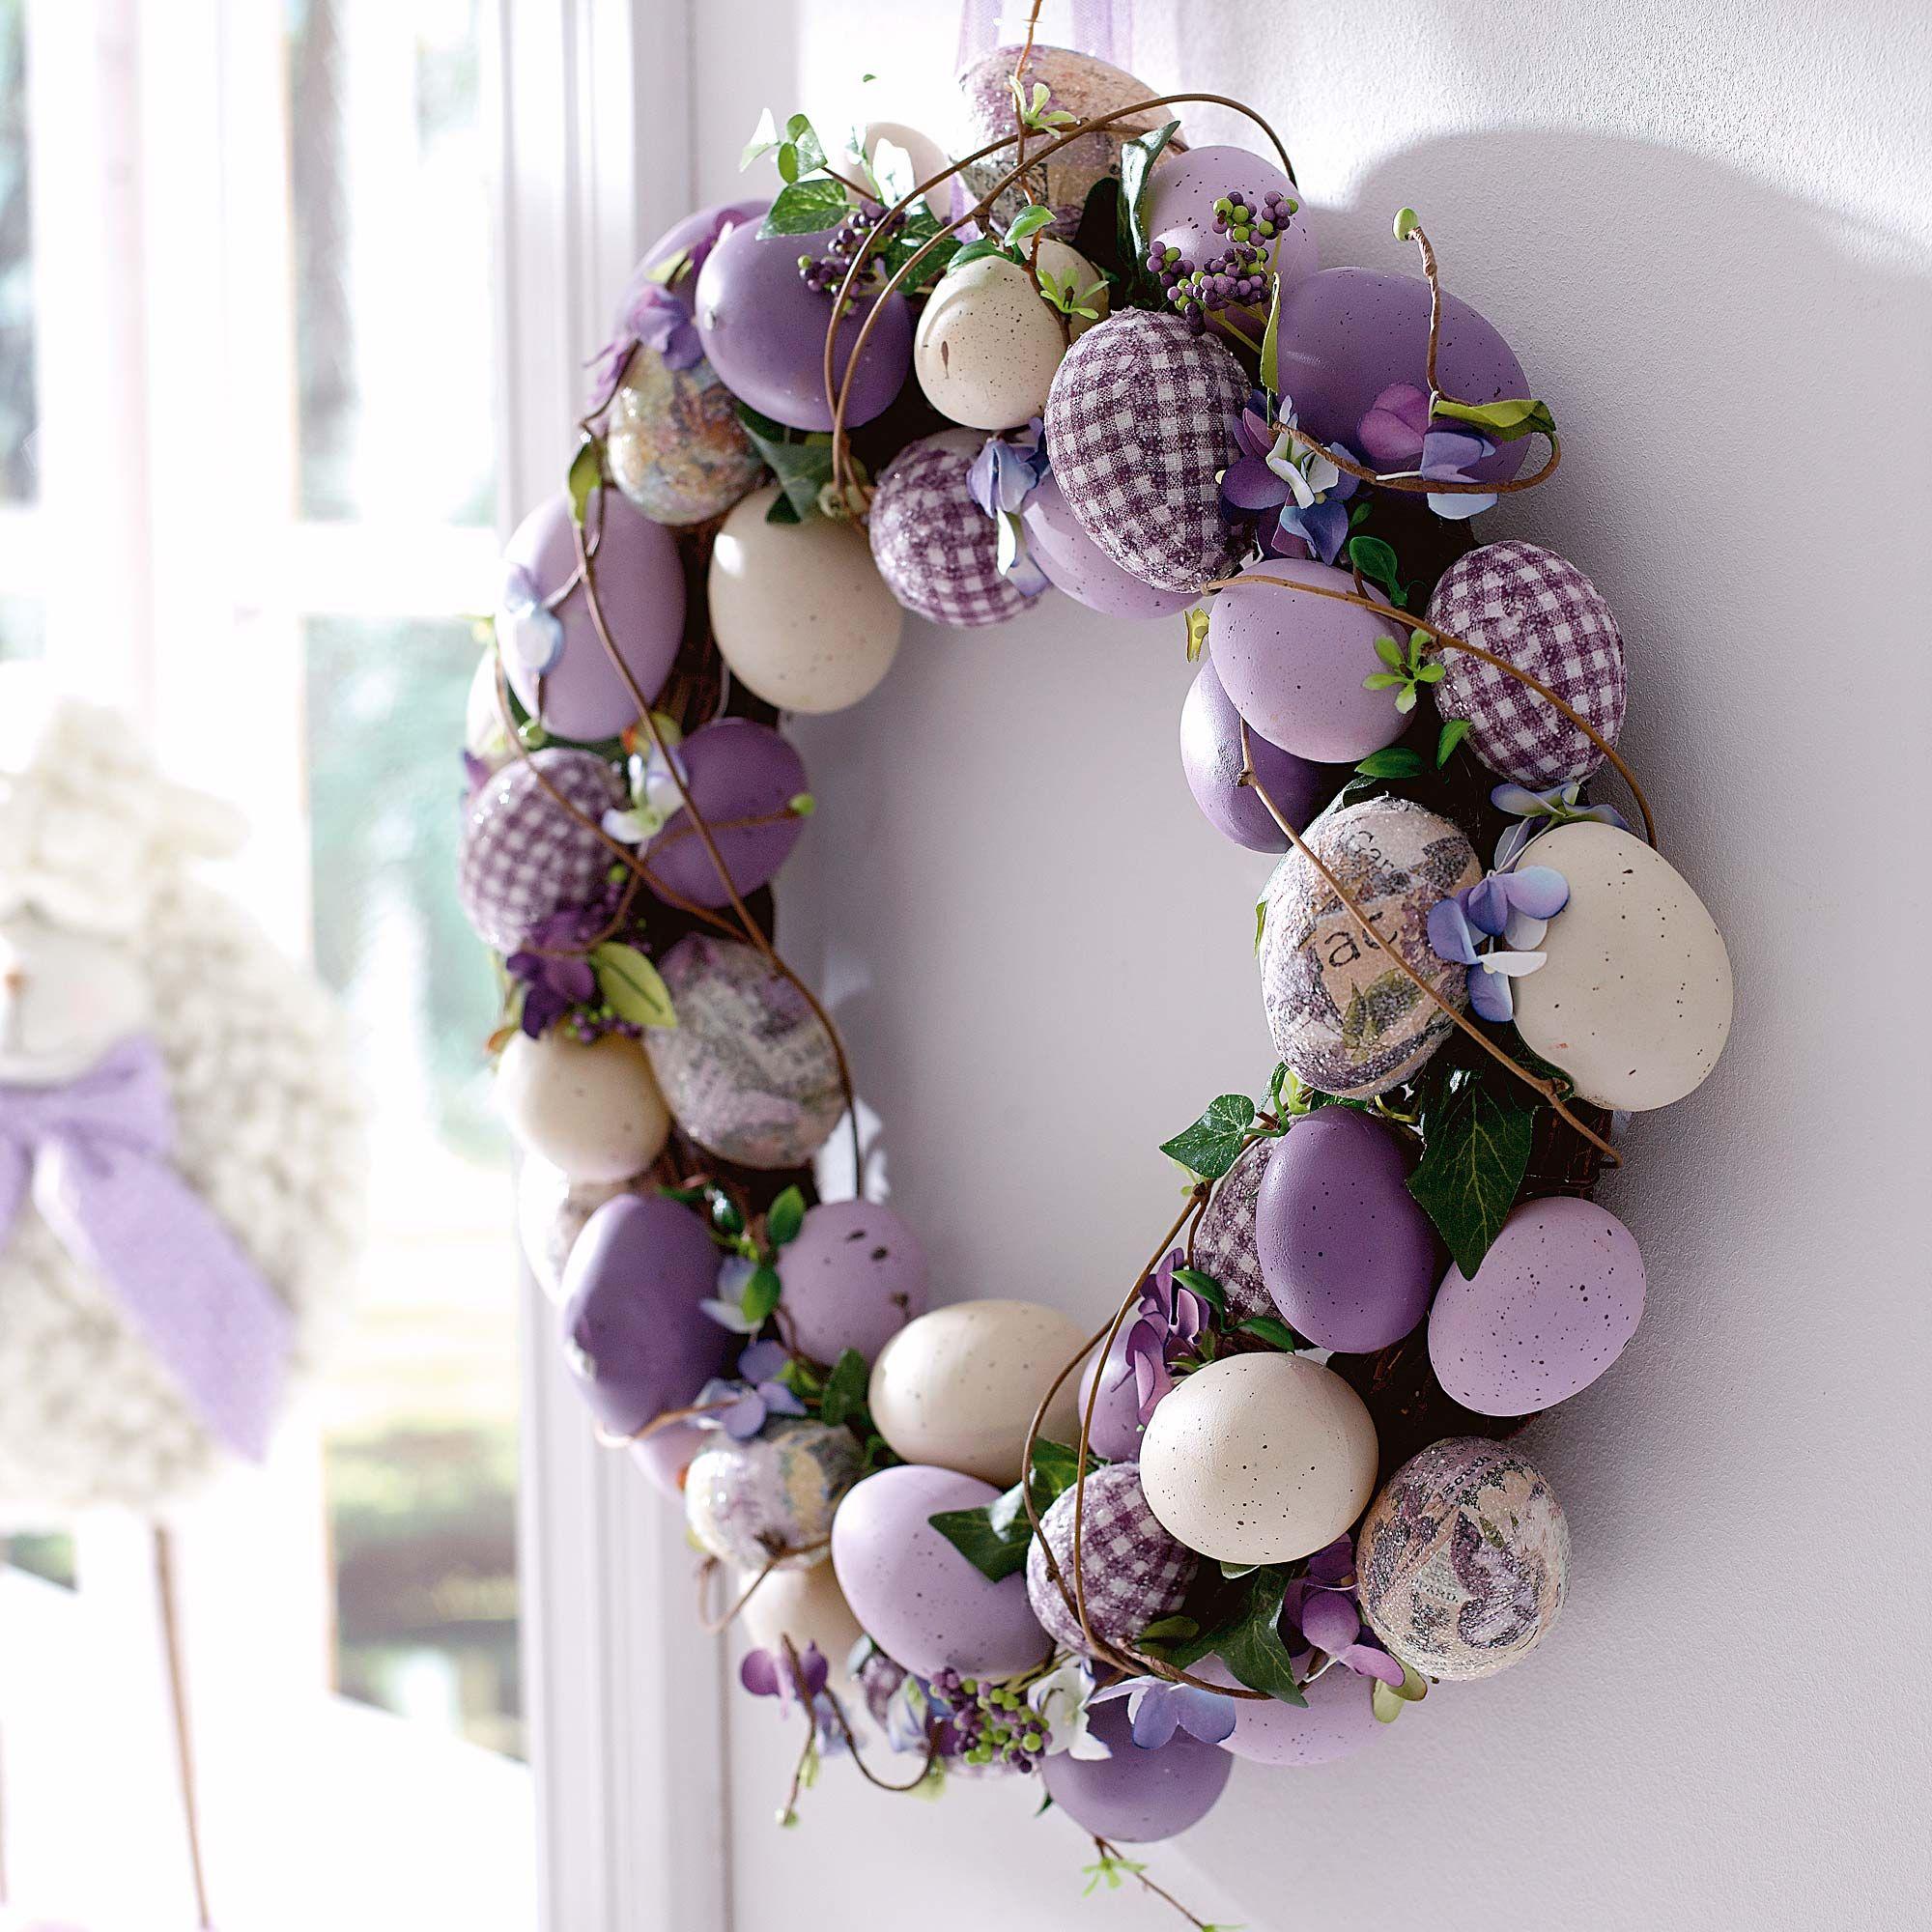 Nieggs Easter Pinterest